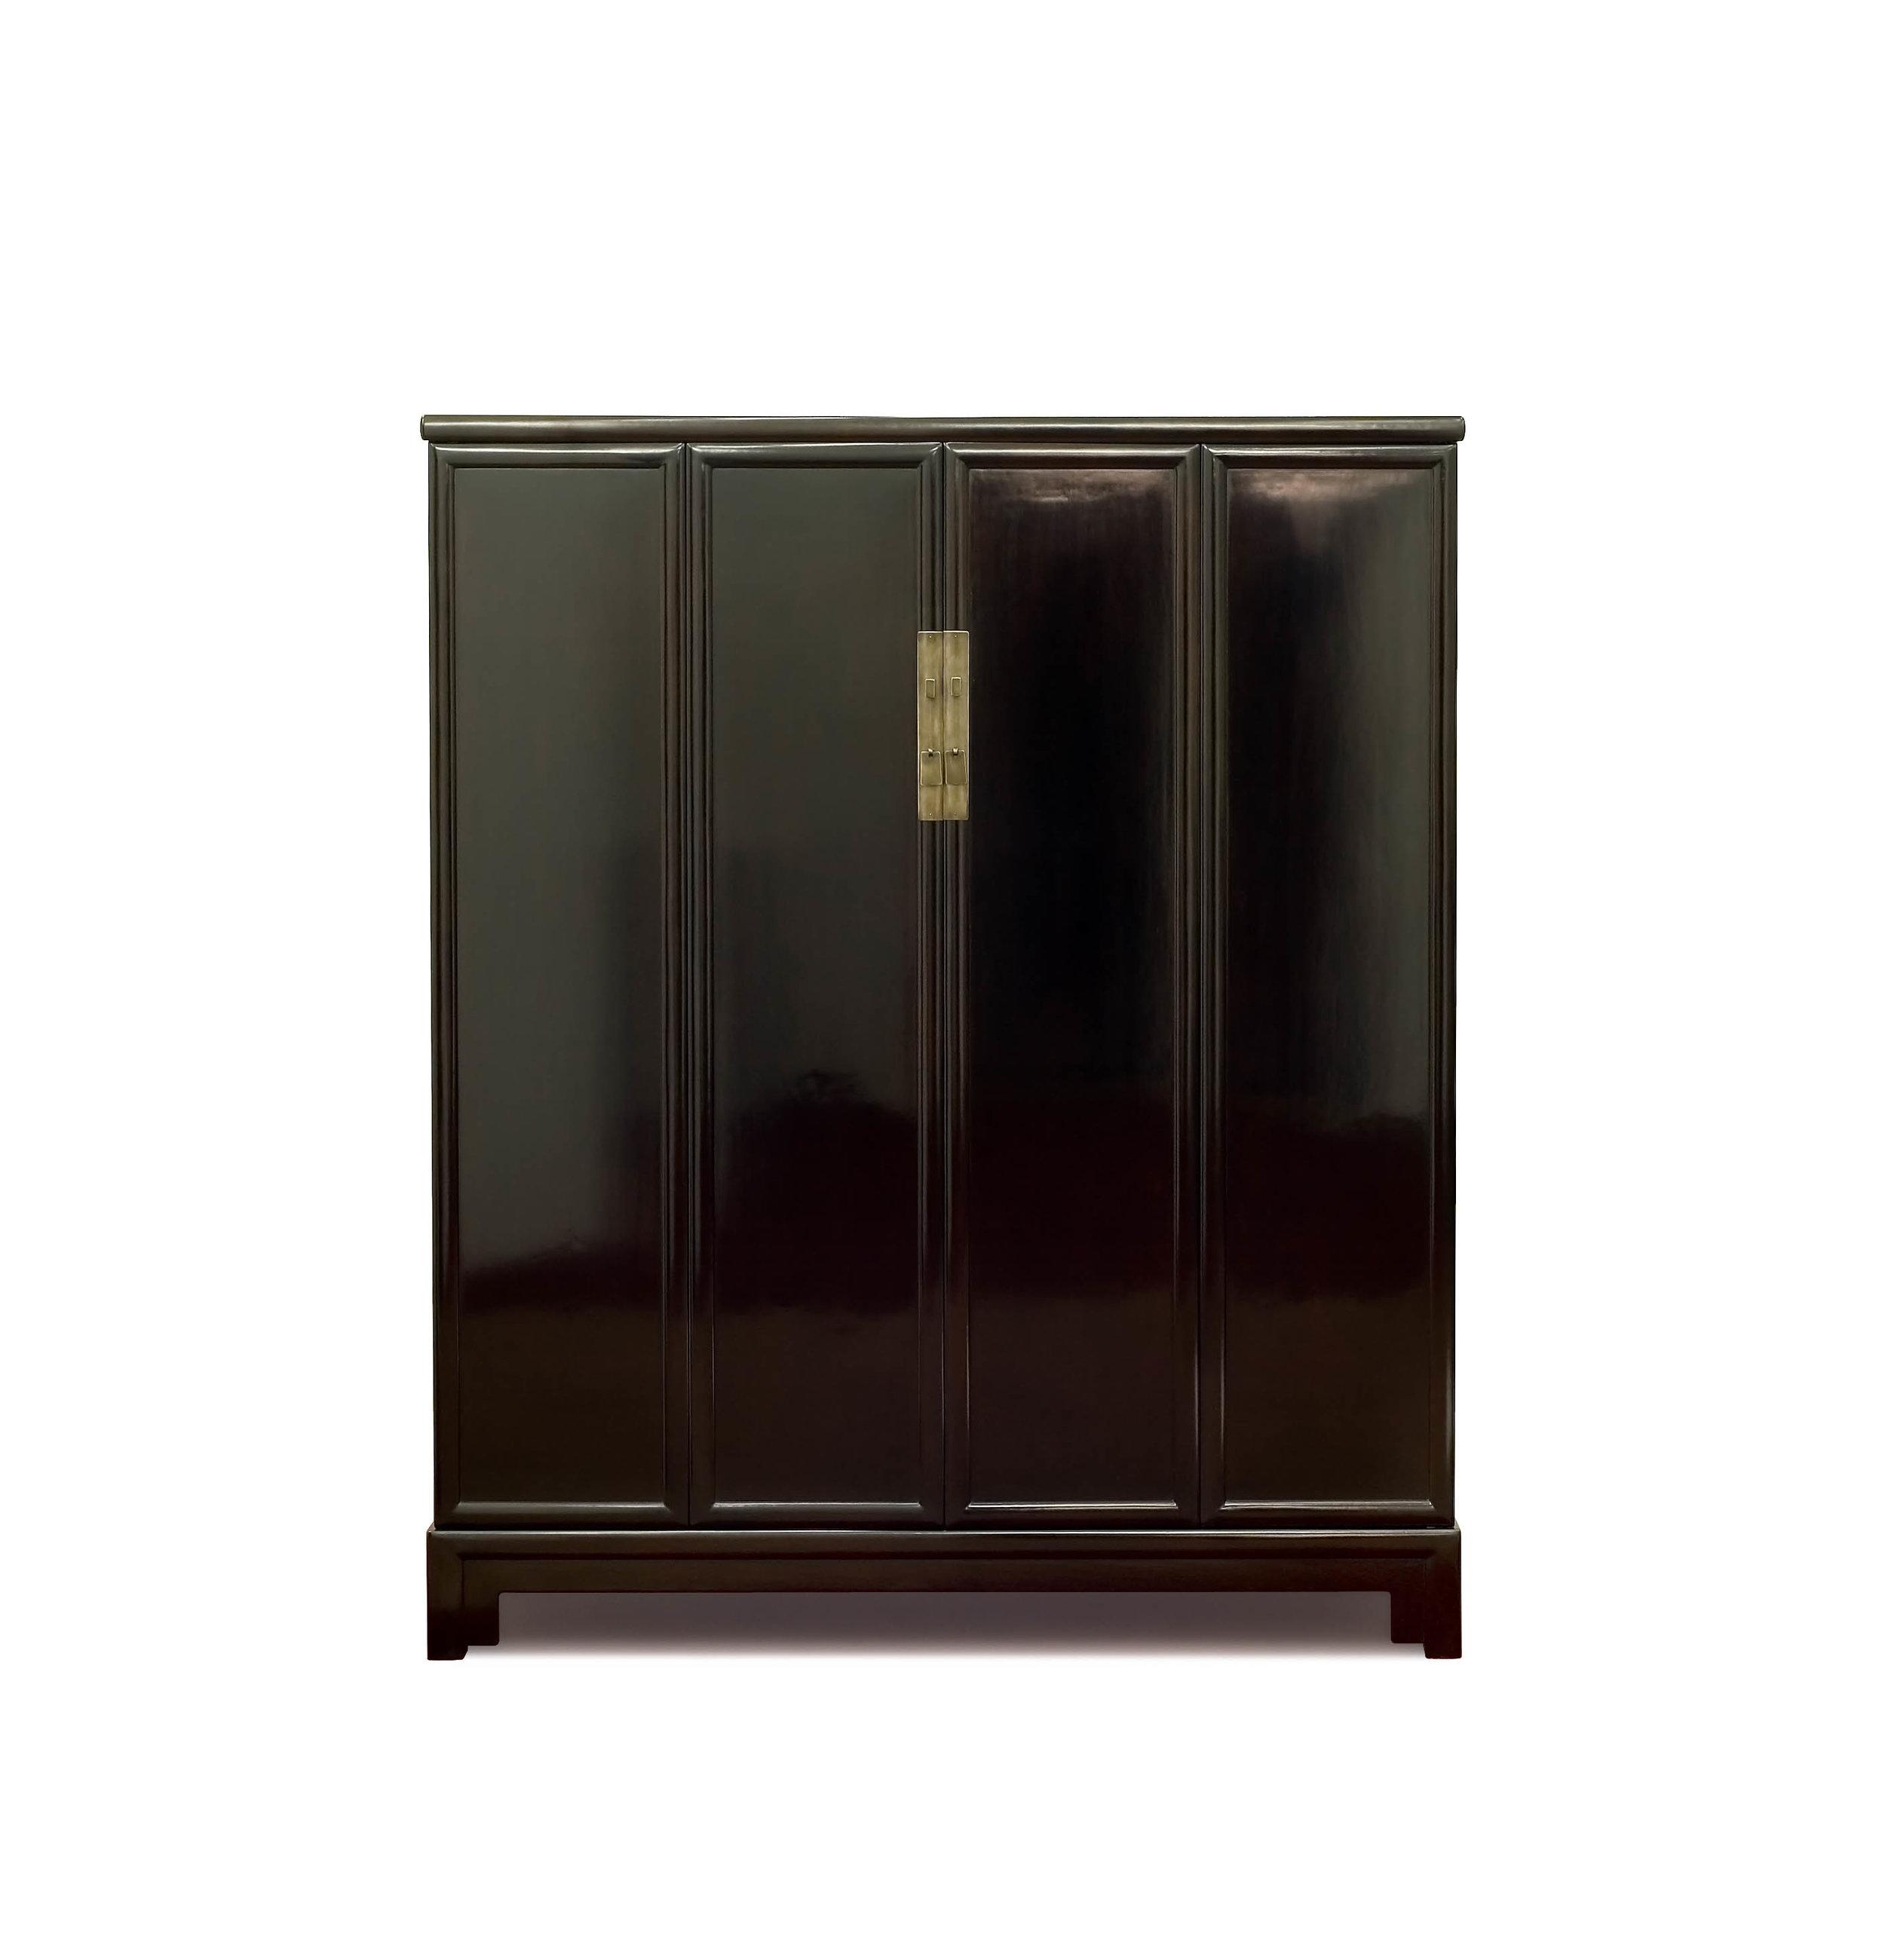 ....chinese ming style furniture : TV cabinet..中式明式家具 : 电视柜....